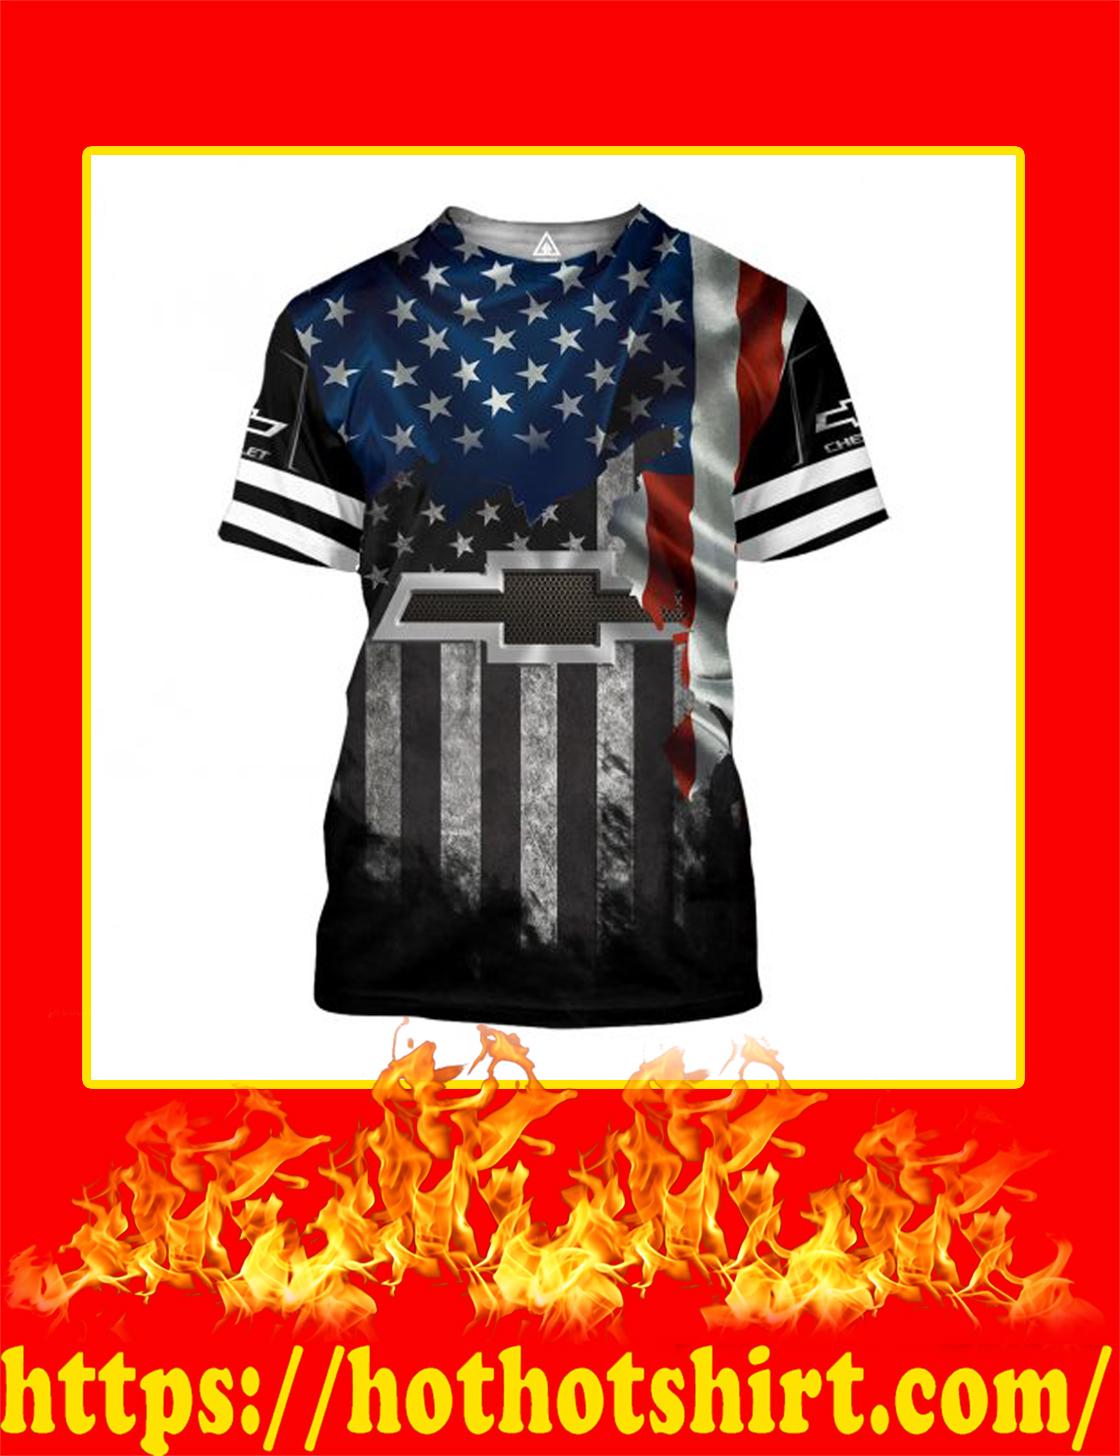 Chrvolet American Flag 3D All Over Printed 3d Shirt